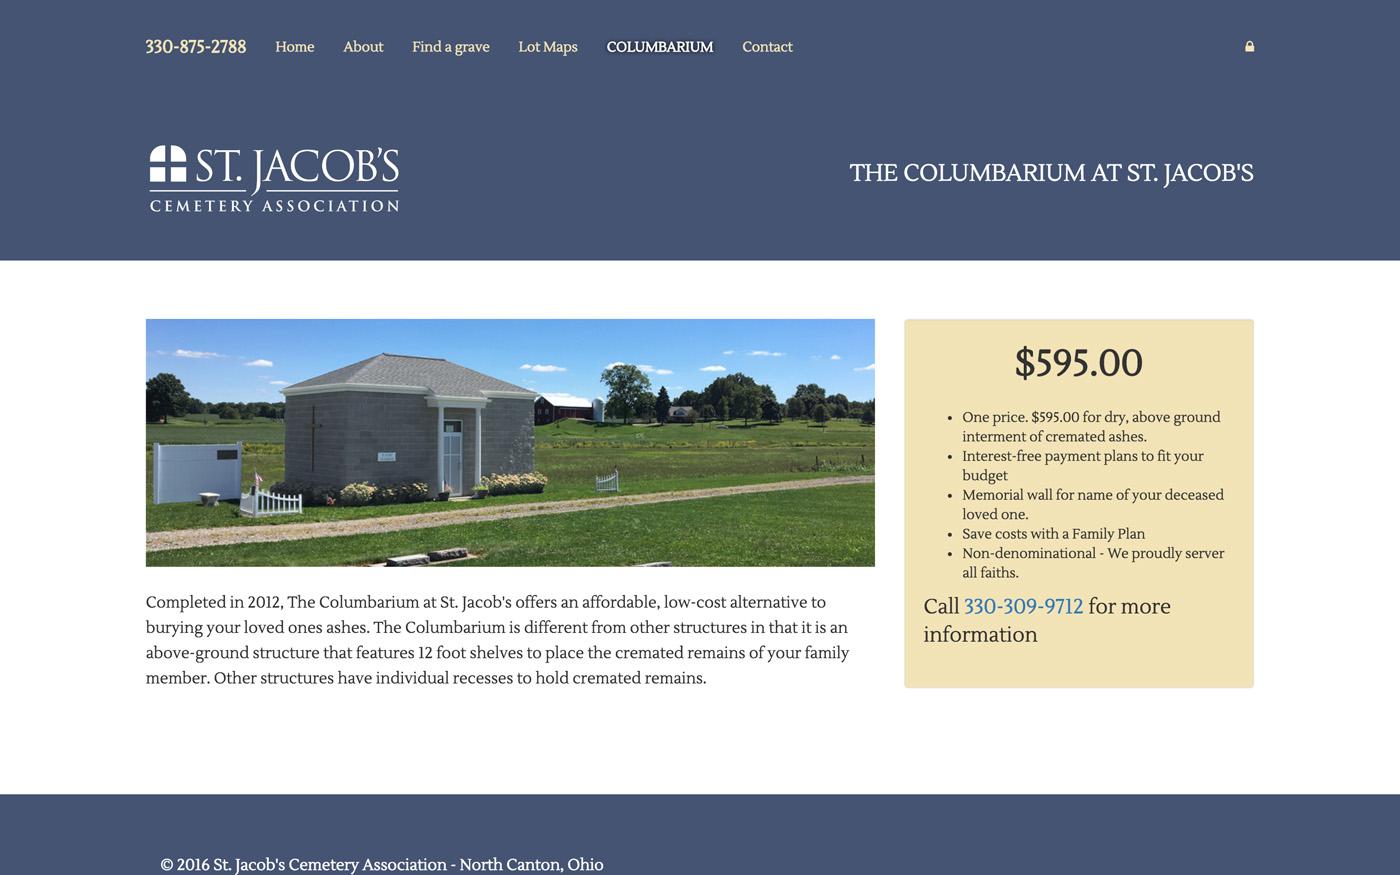 st-jacobs-columbarium-page.jpg